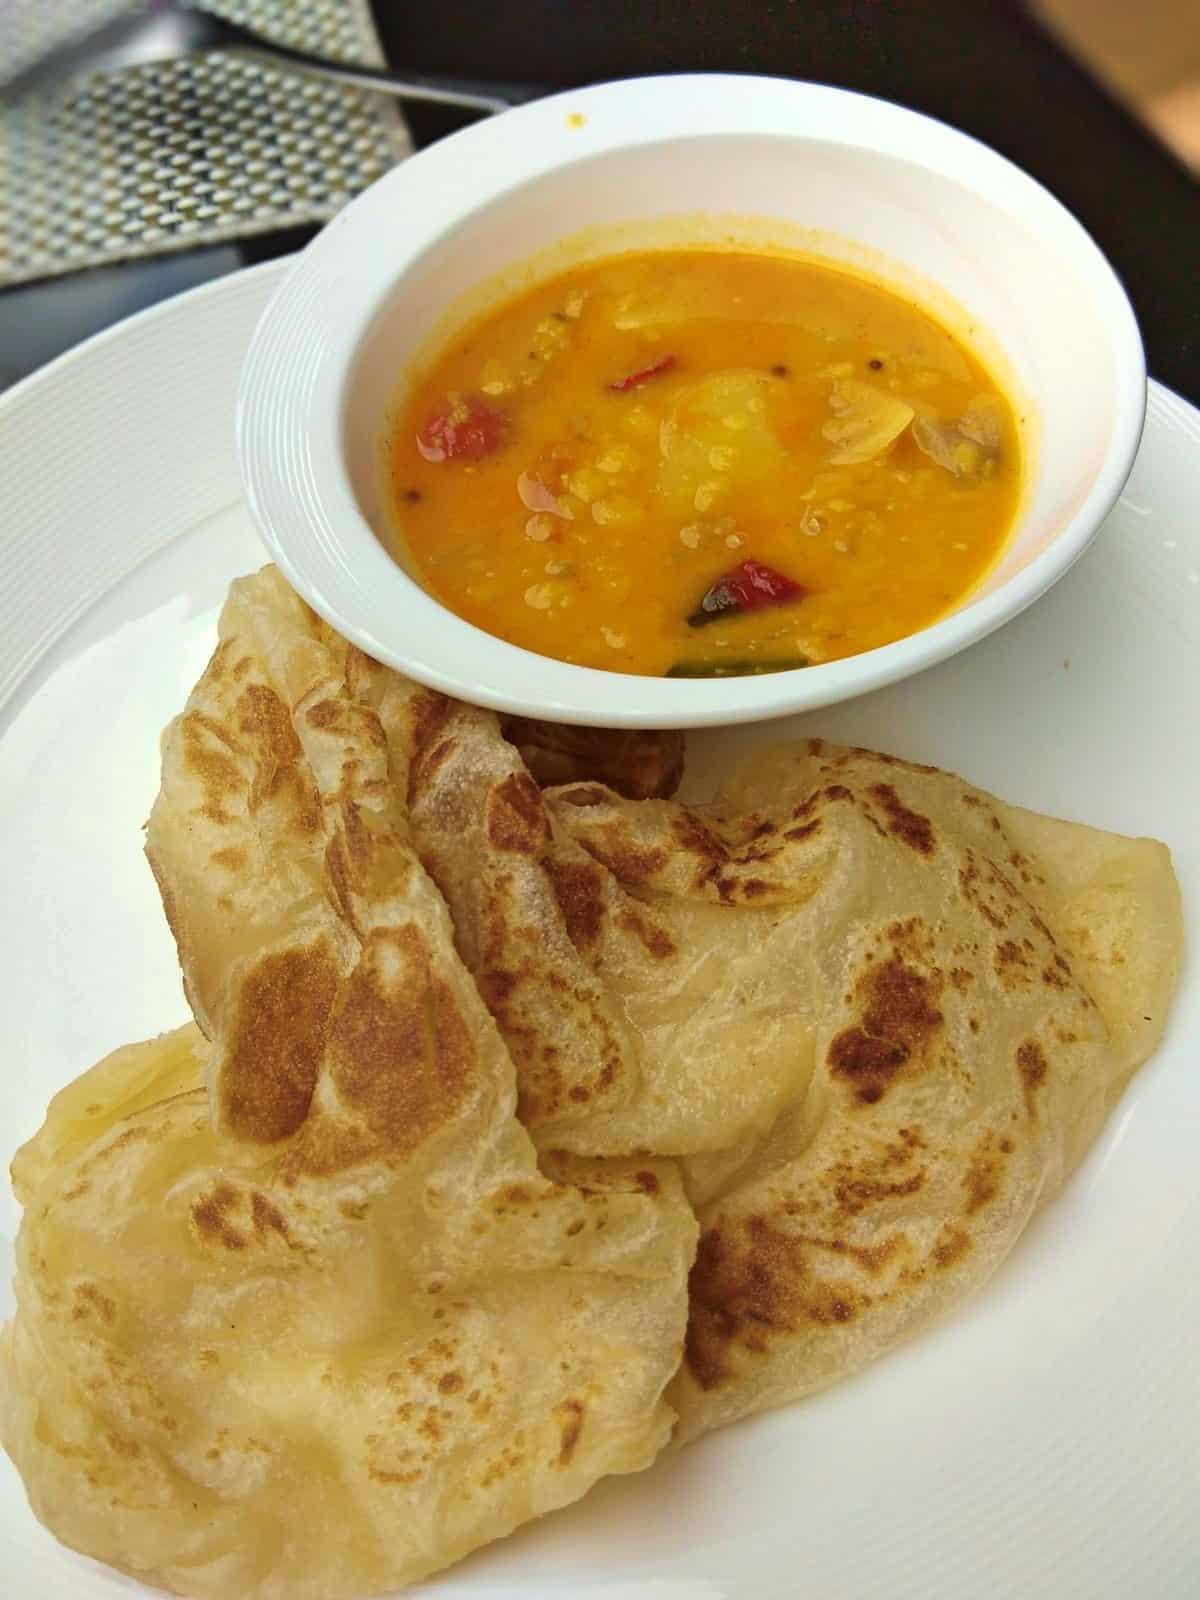 roti-canai-Malaysian-food-Kuala-Lumpur-Travel-Mermaid-01